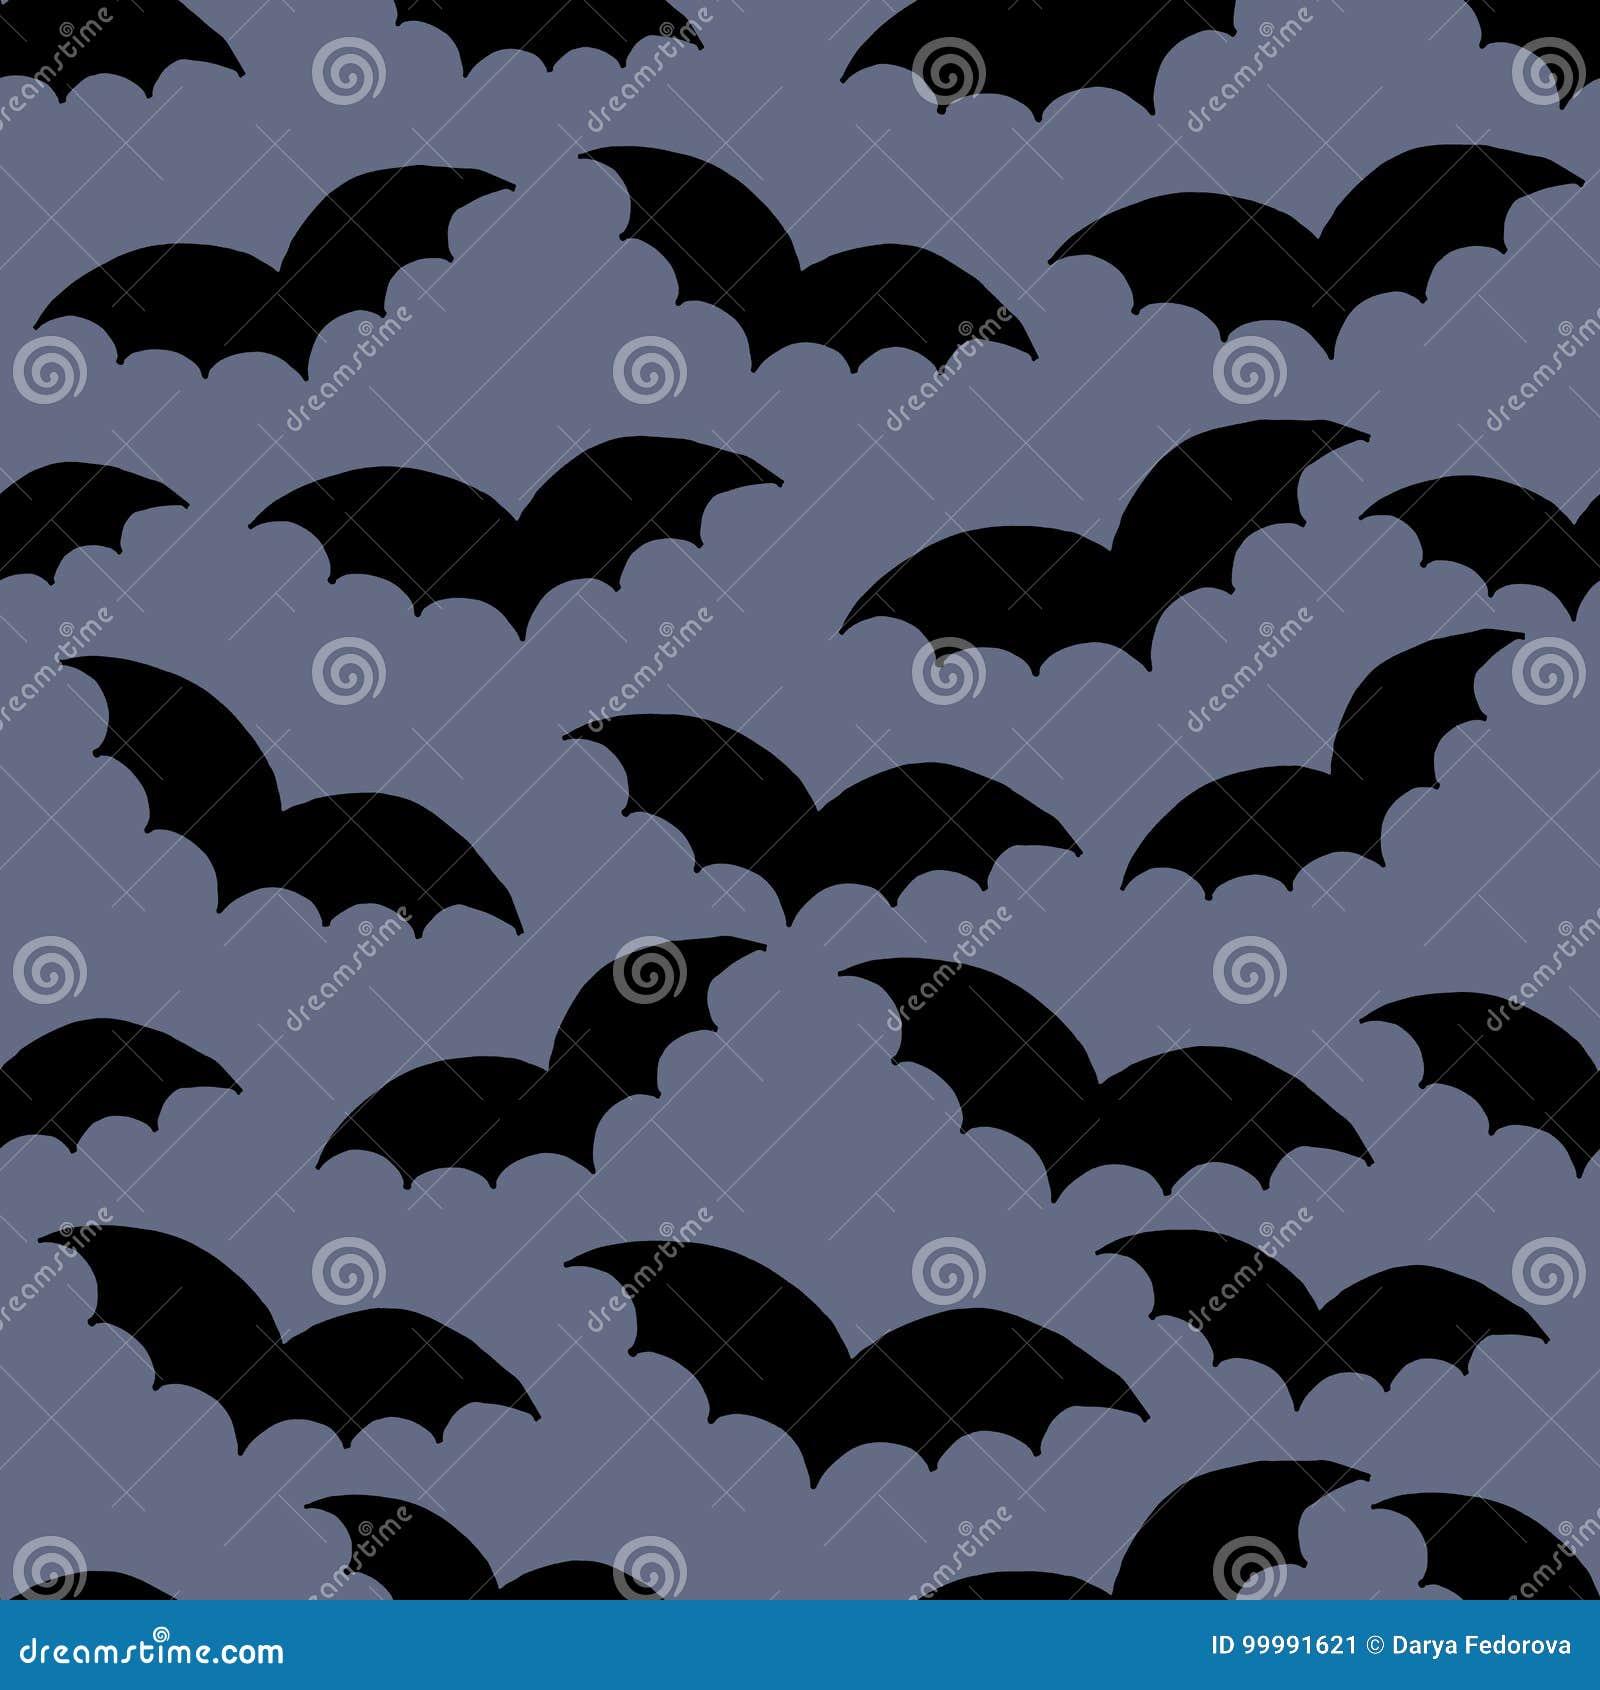 Halloween Seamless Doodle Hand Drawn Pattern Swarm Of Black Bat